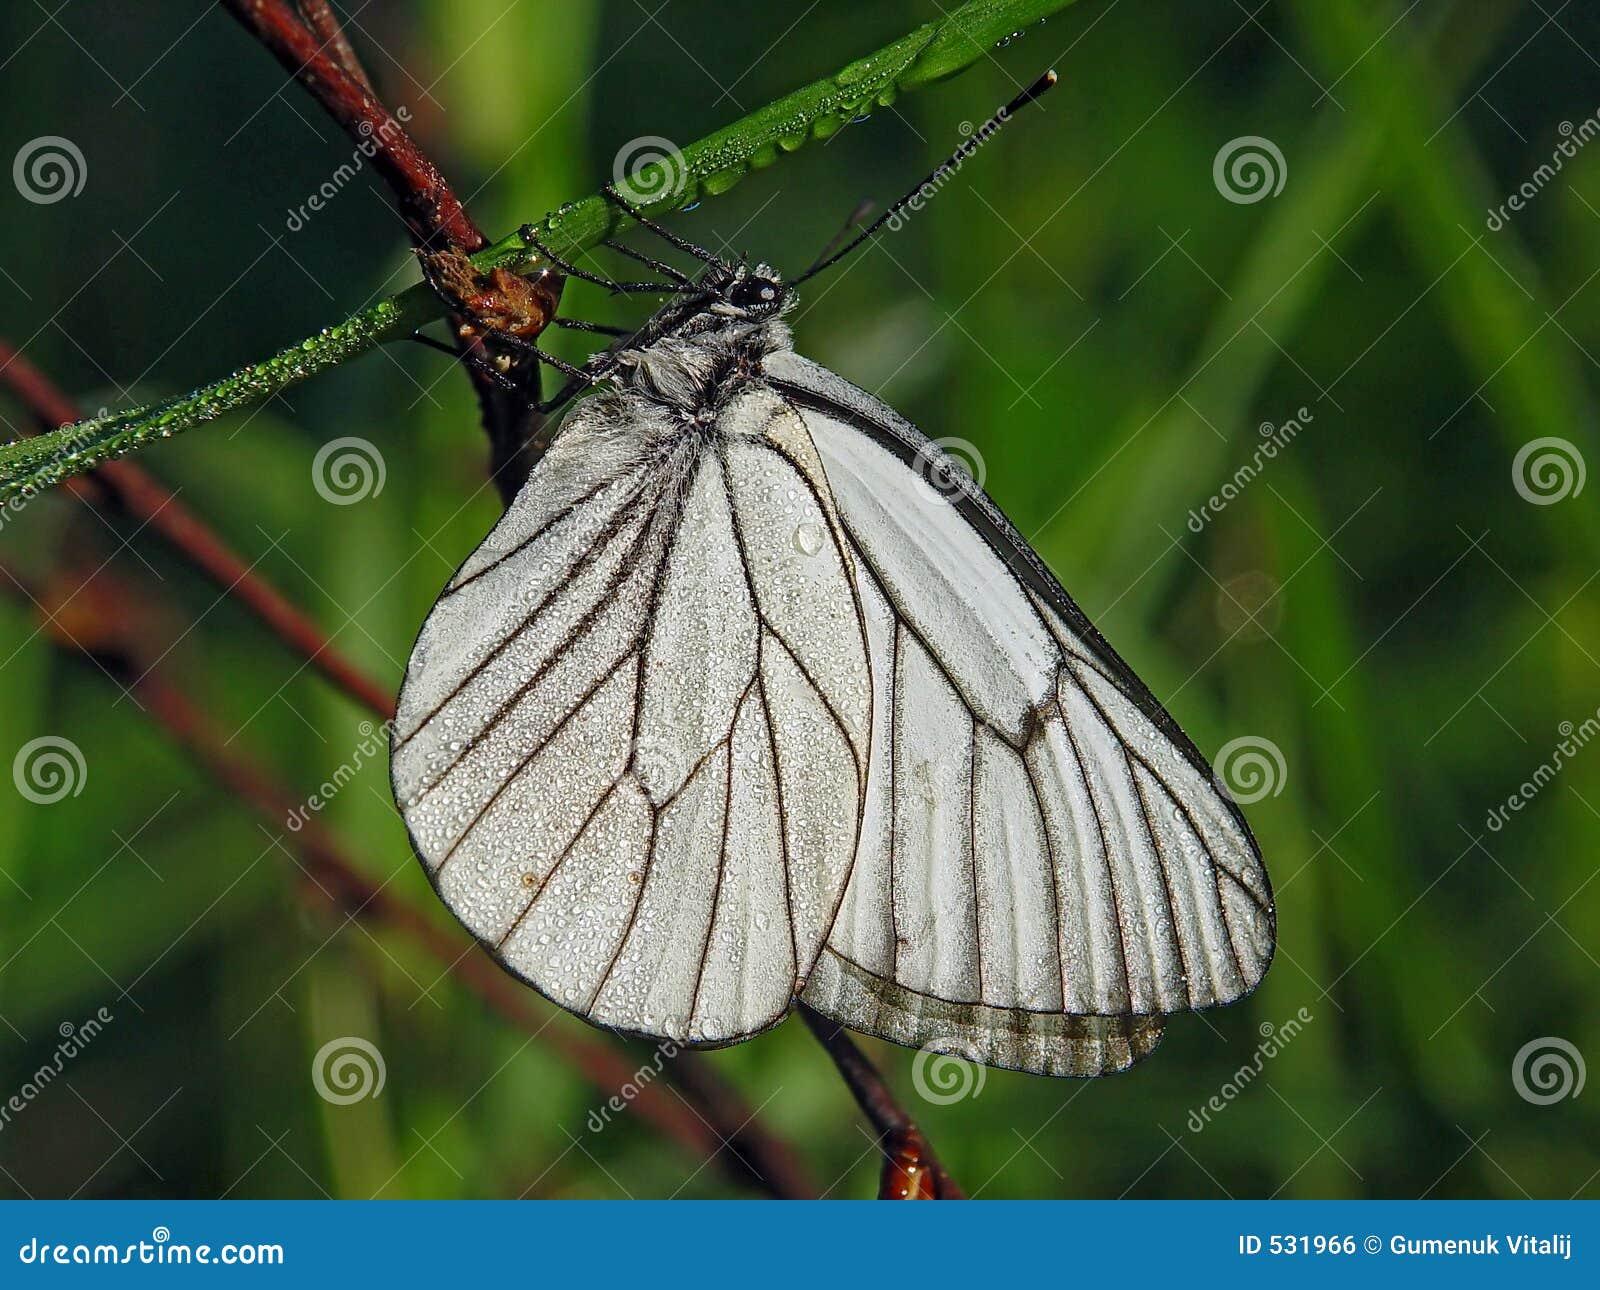 Download Aporia crataegi 库存照片. 图片 包括有 草甸, 早晨, 空白, 柔软, 下落, 夏天, 露水 - 531966